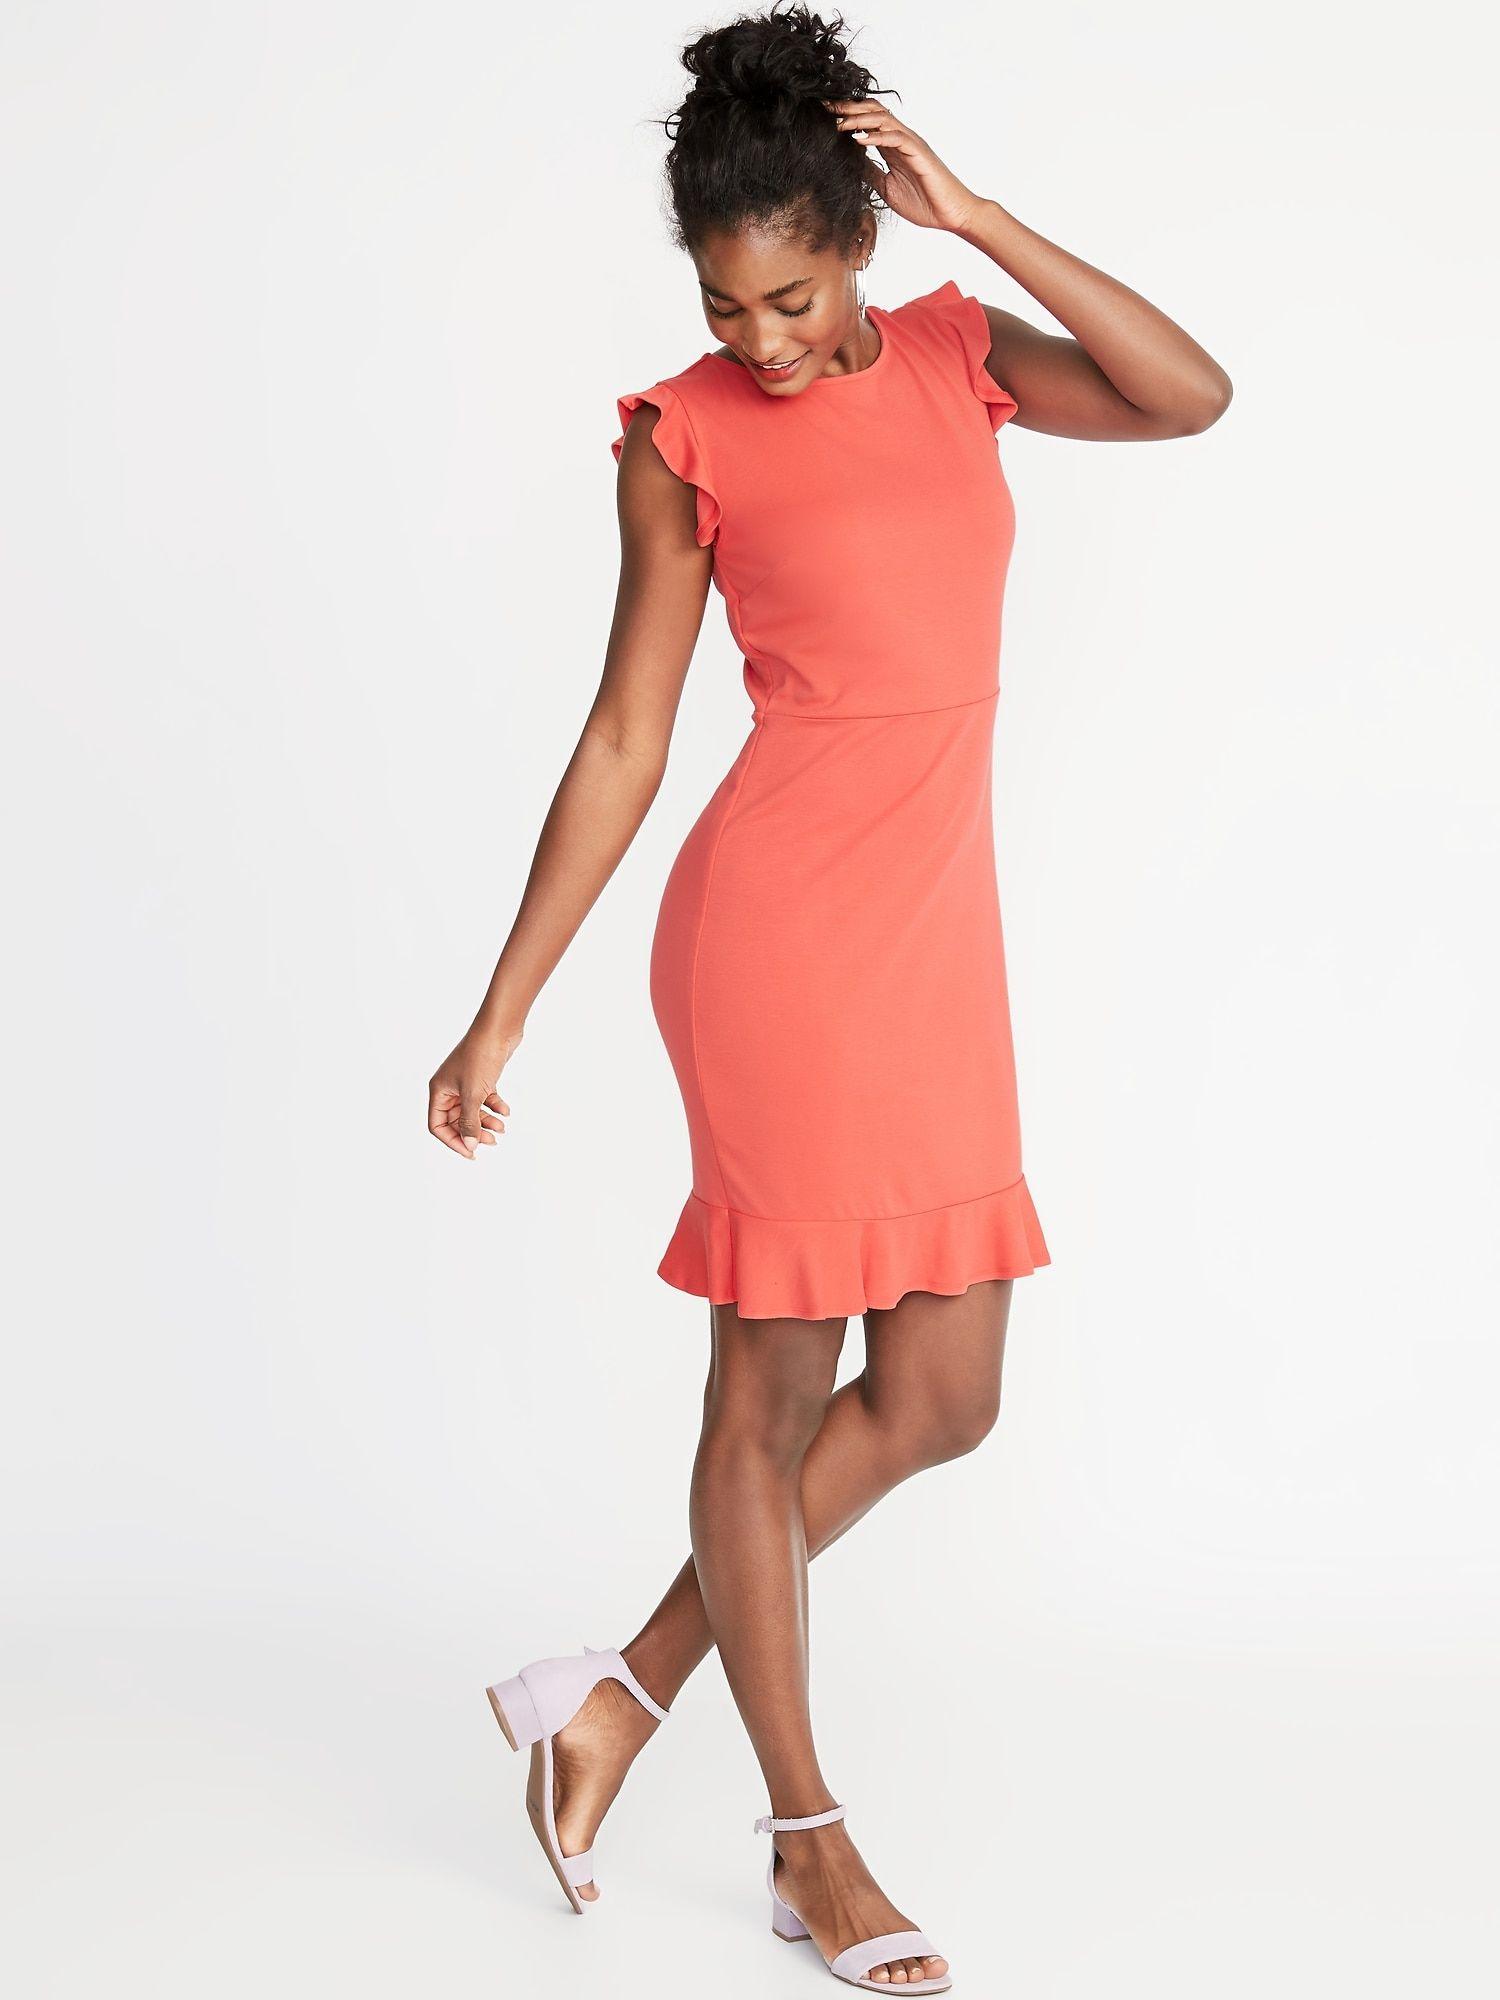 dd5aa46a0be1 Ruffled Ponte-Knit Sheath Dress for Women in 2019